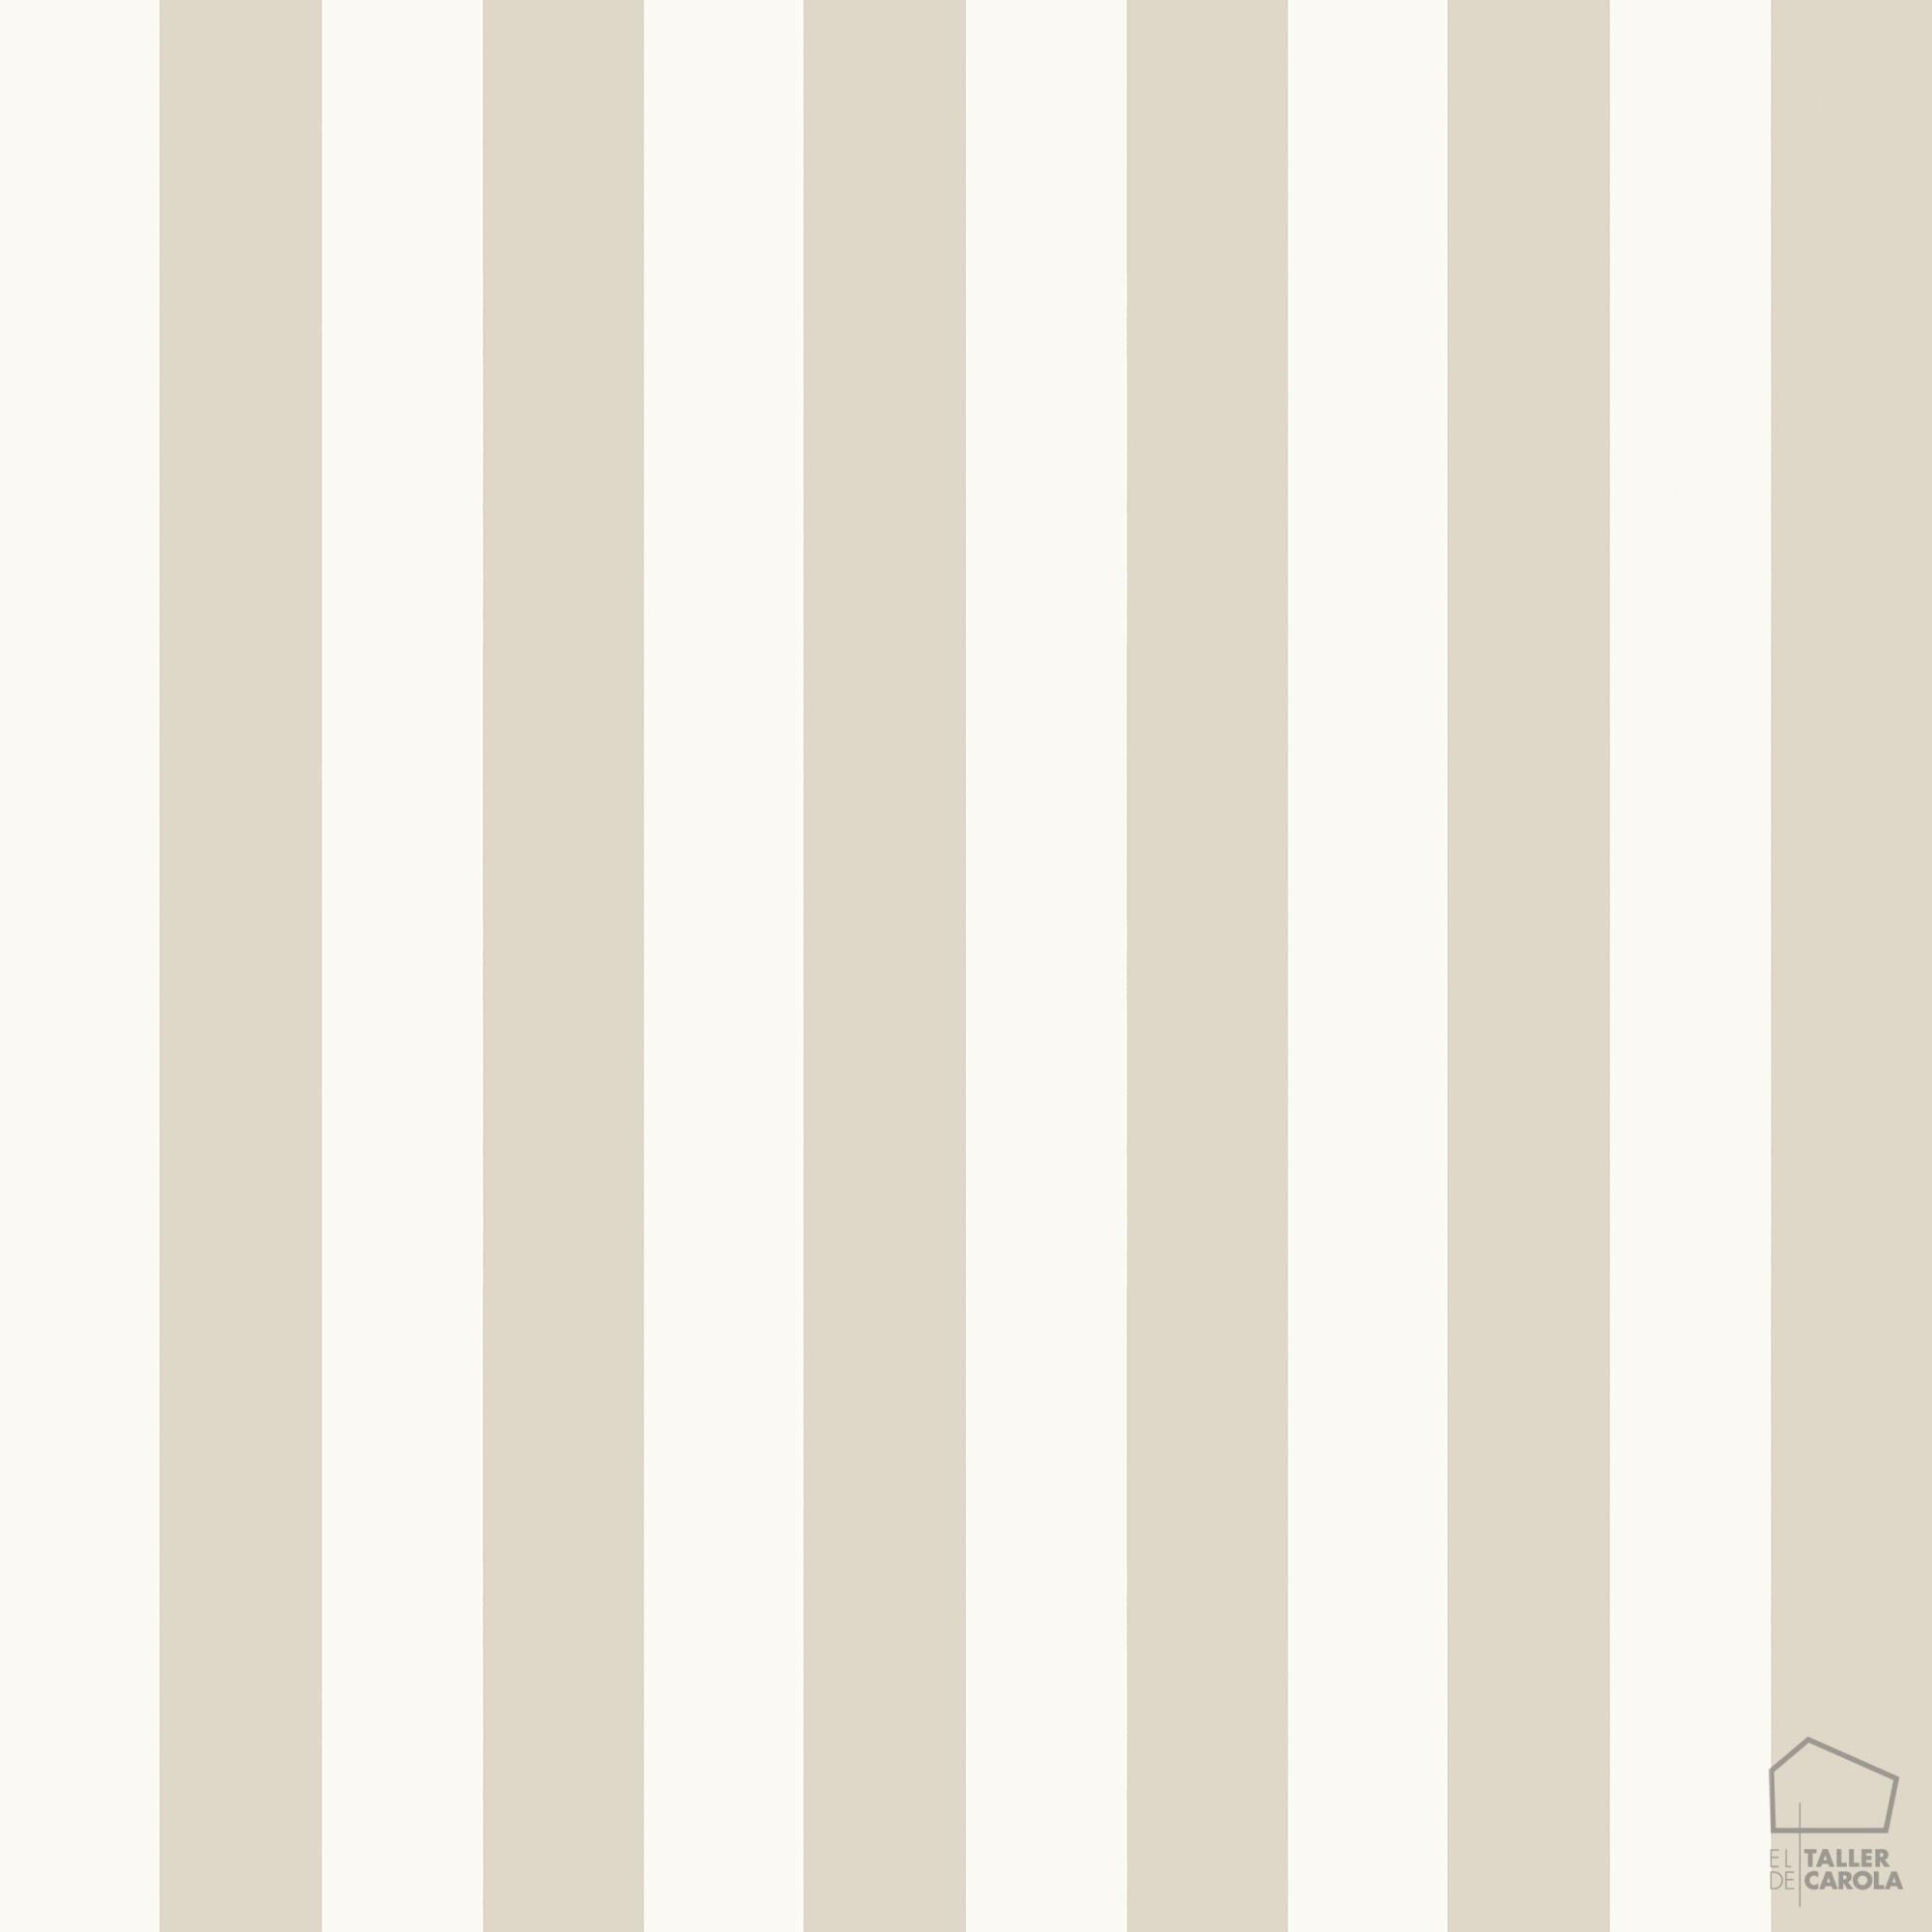 Papel pintado a rayas papel pintado rayas papel pintado - Papel pintado rayas ...